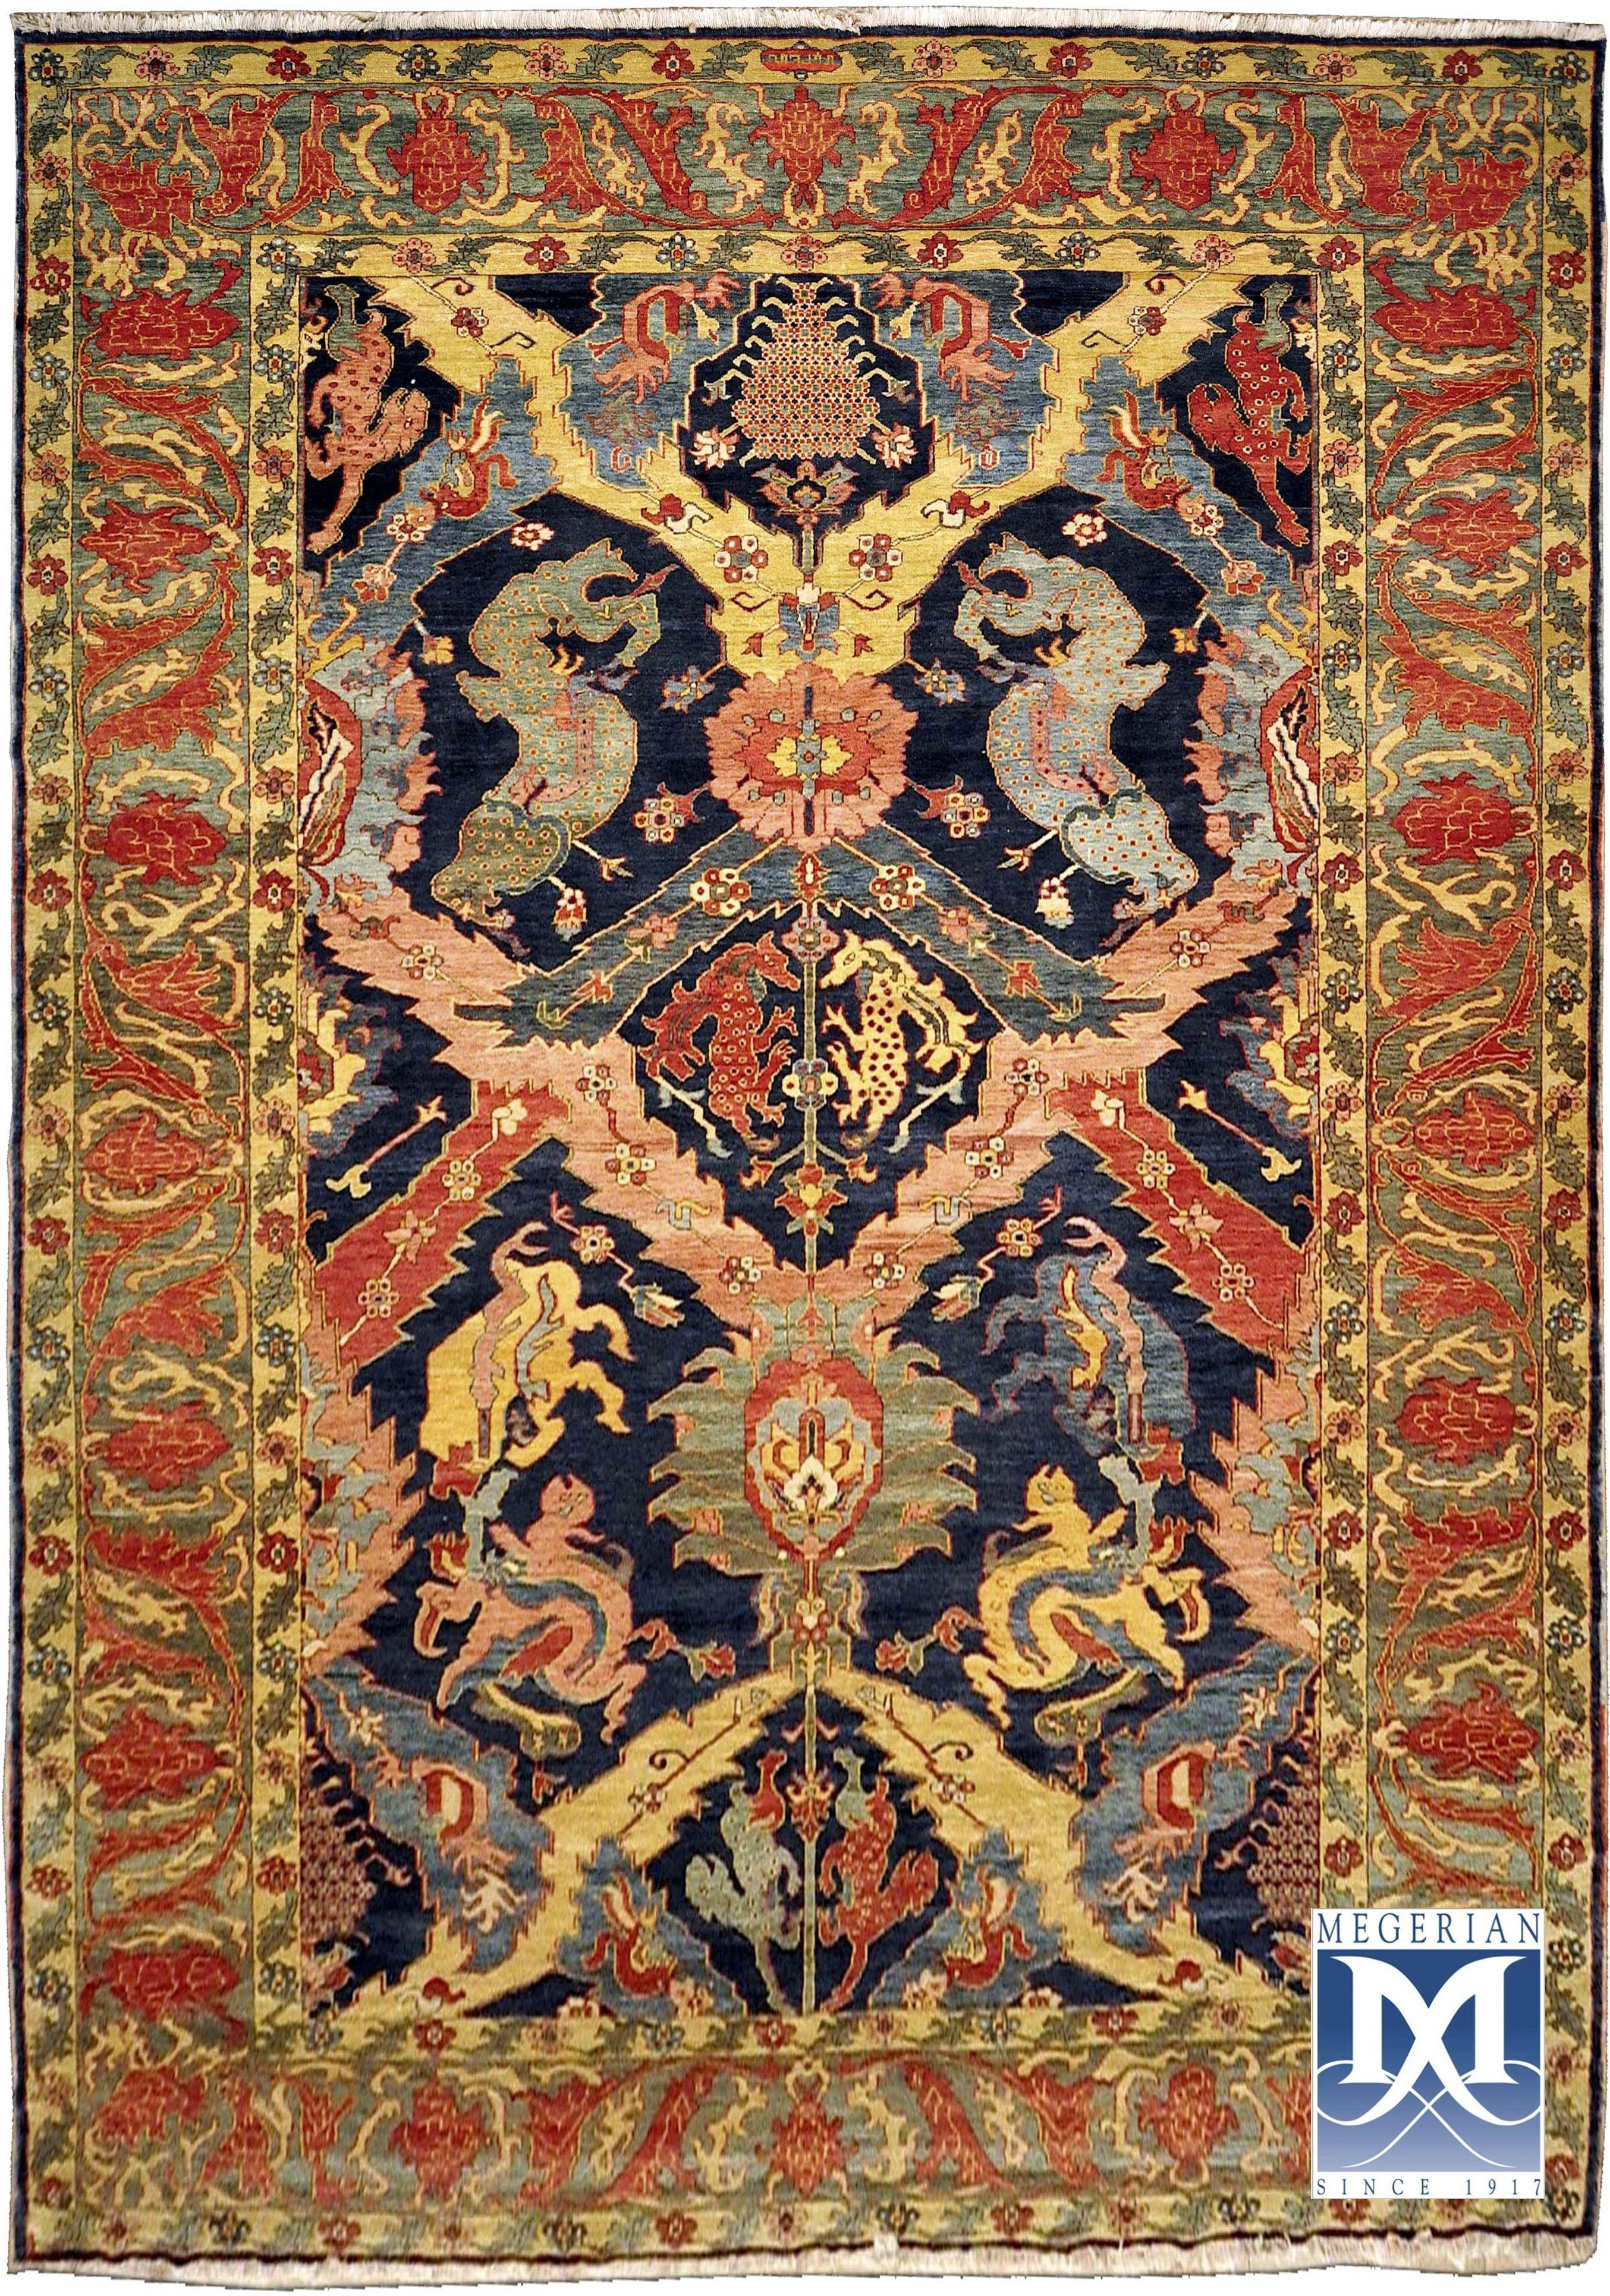 armenian classical dragon rug by megerian carpet company, handmade